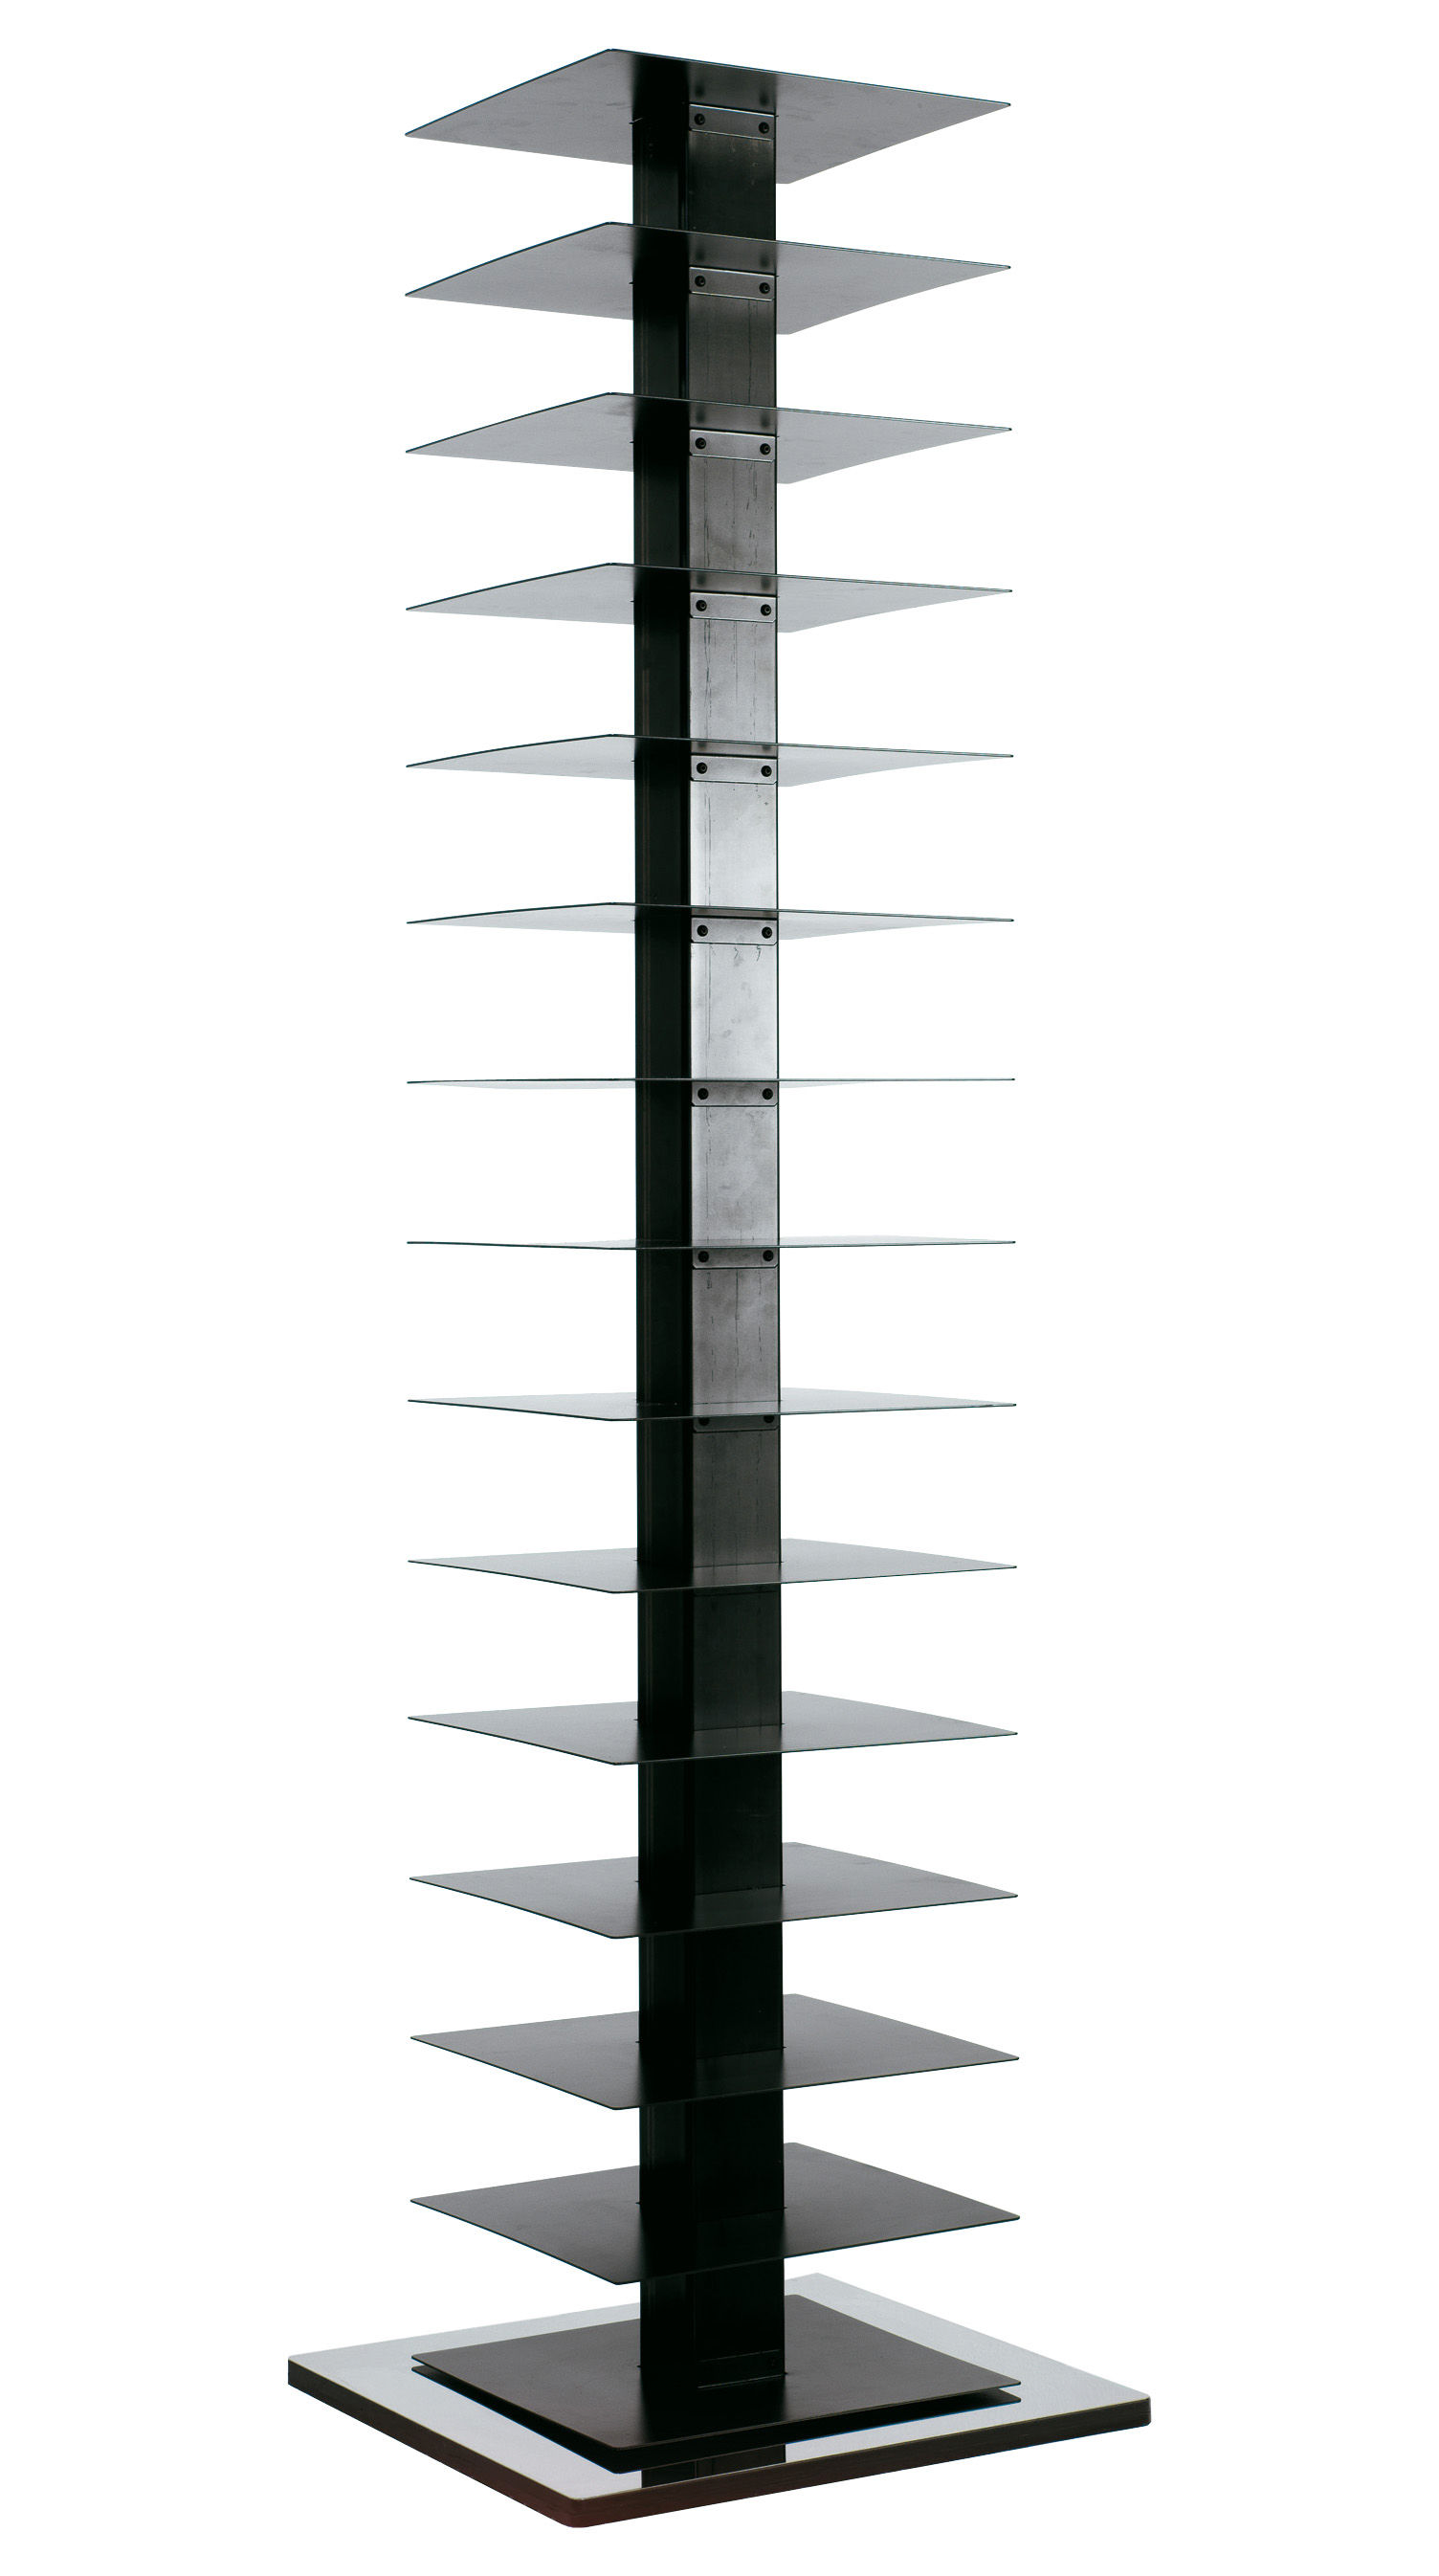 Furniture - Bookcases & Bookshelves - Ptolomeo Rotating bookshelf - 4 sides - Horizontal storage by Opinion Ciatti - Polished steel - Black - H 197 cm - Lacquered steel